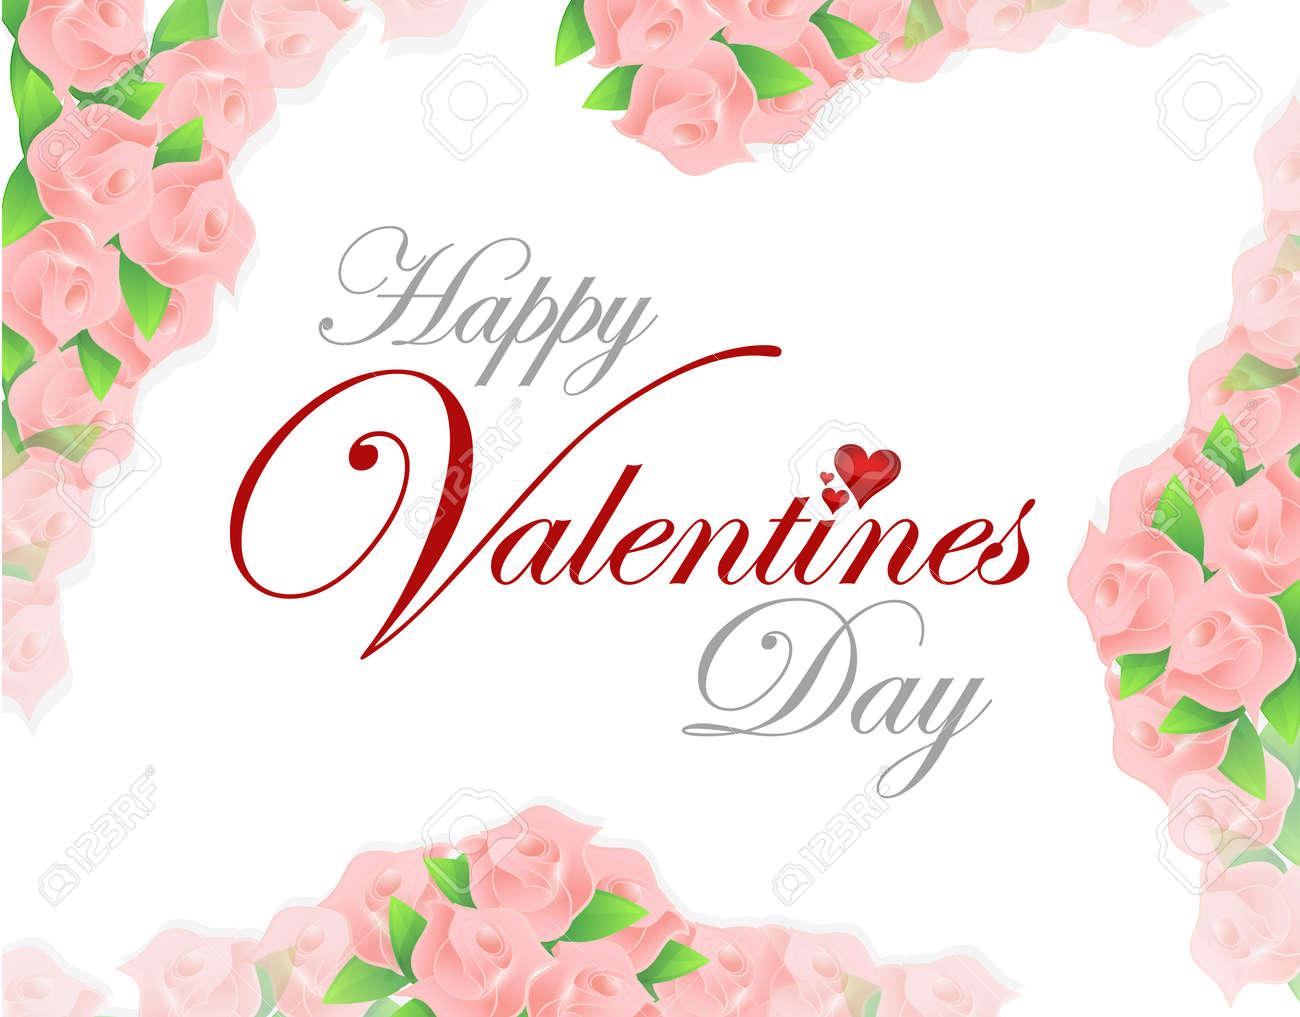 Happy Valentines Day Pink Roses Card Illustration Design Over